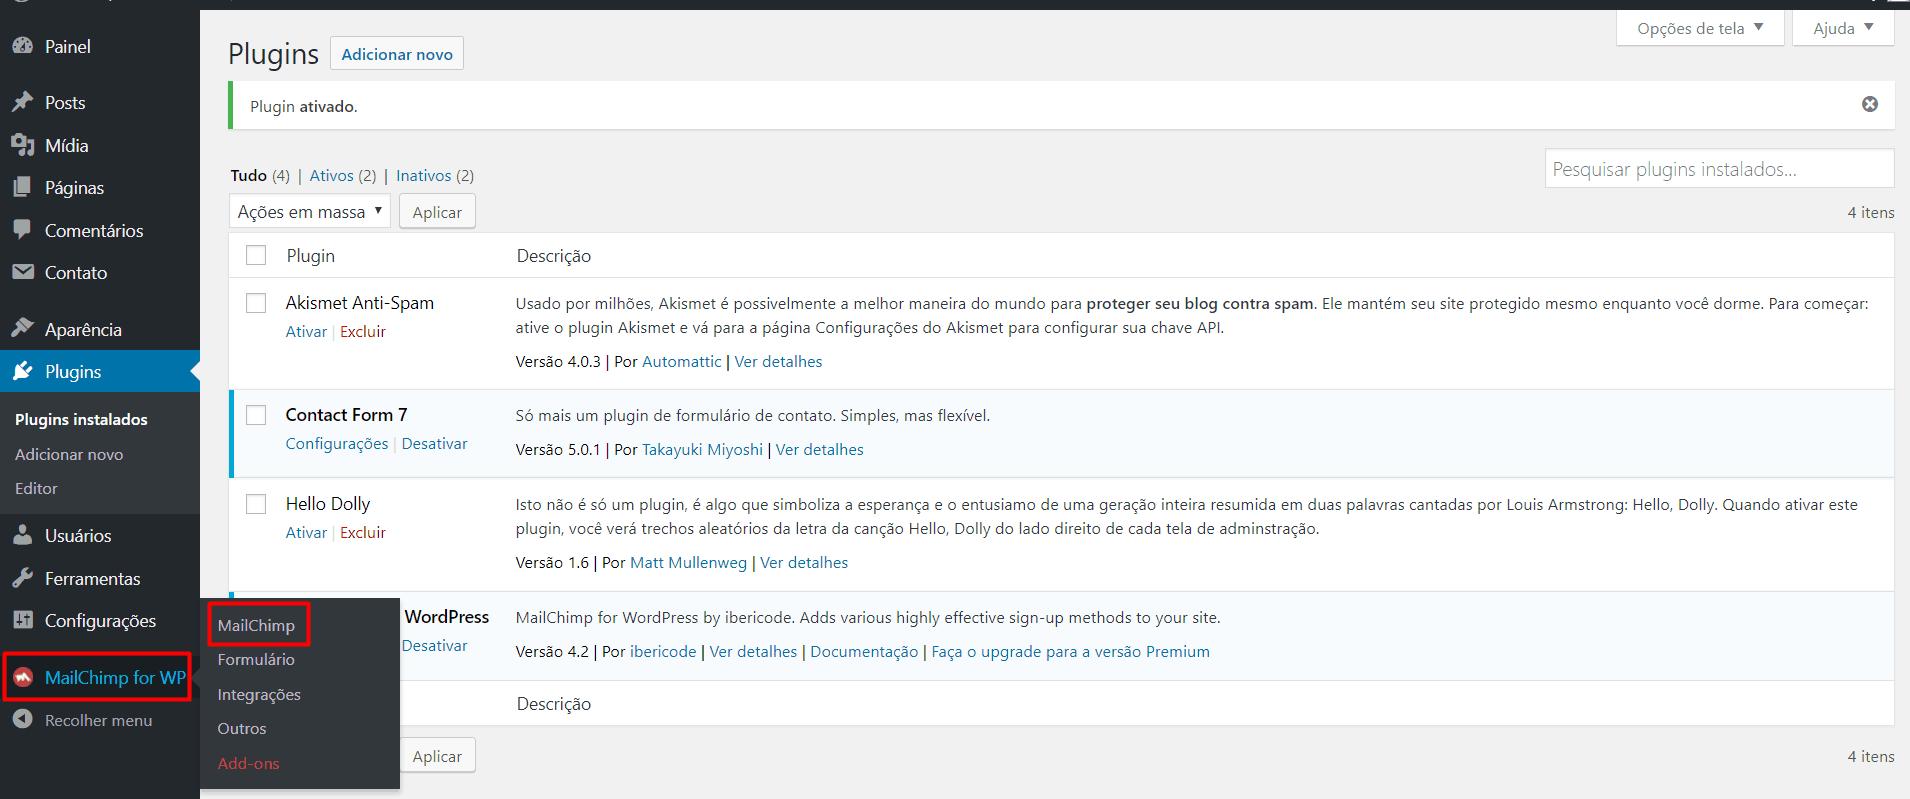 MailChimp for WP